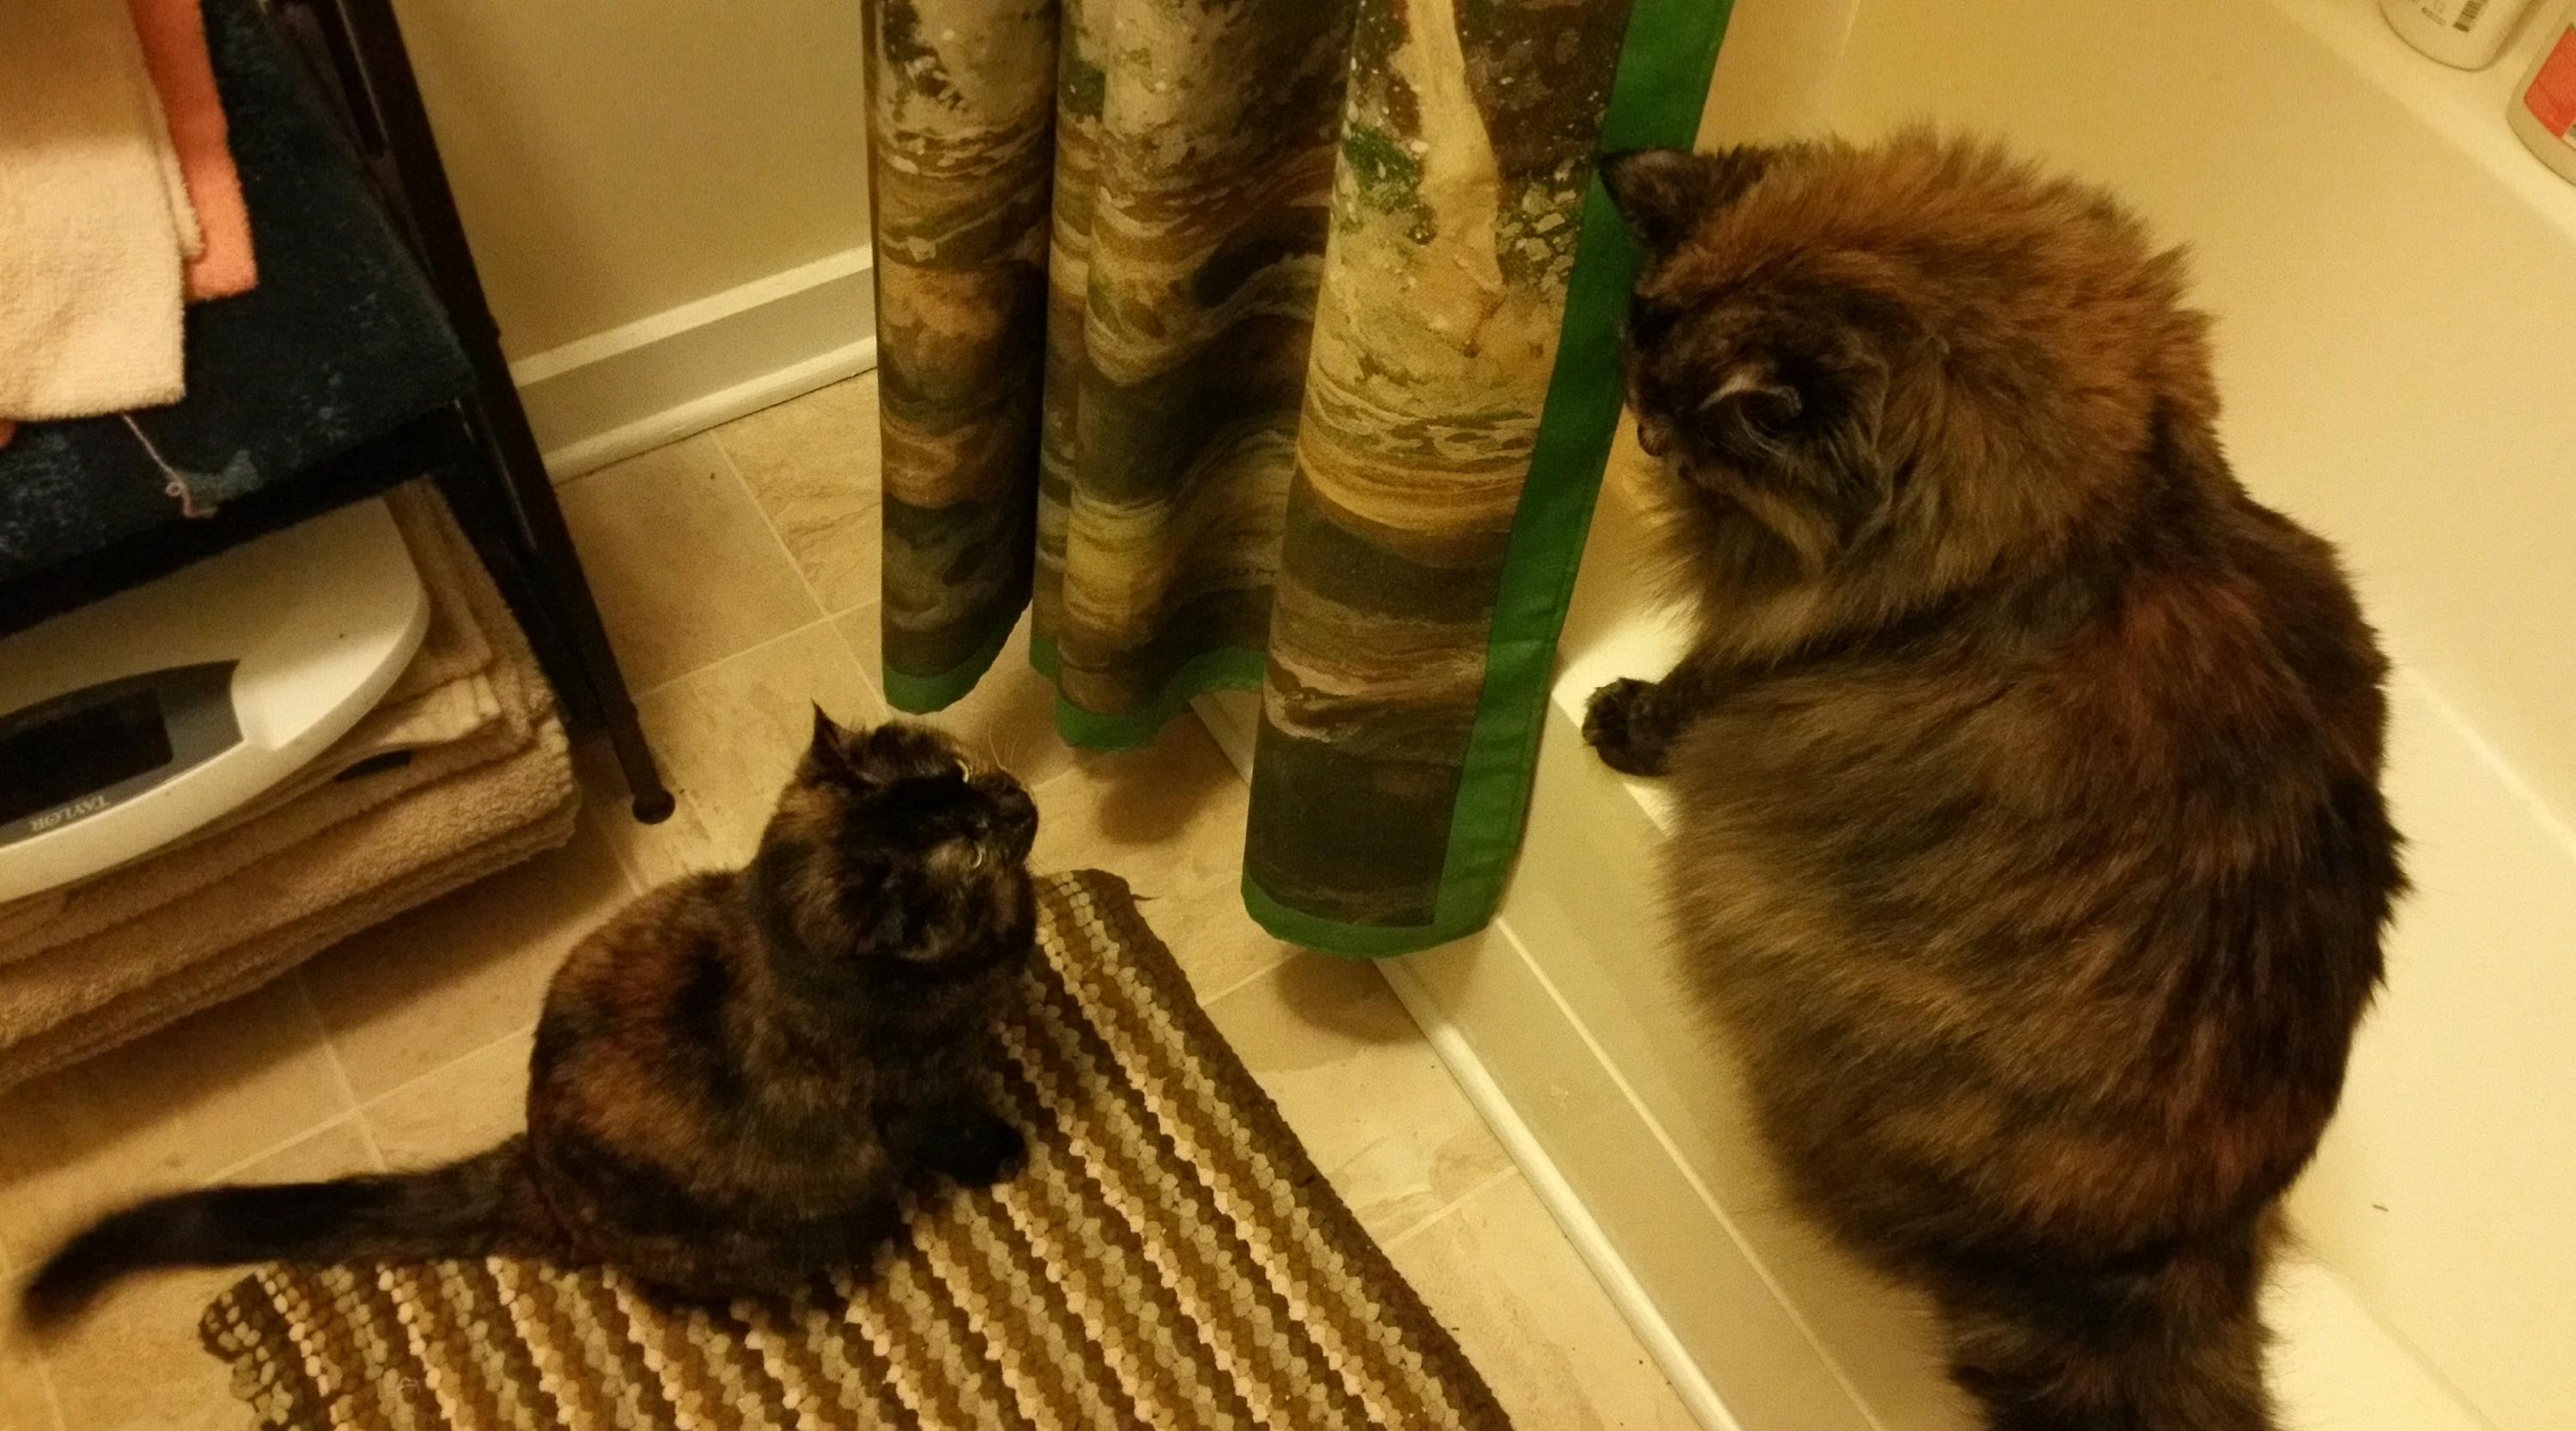 Cat Battles